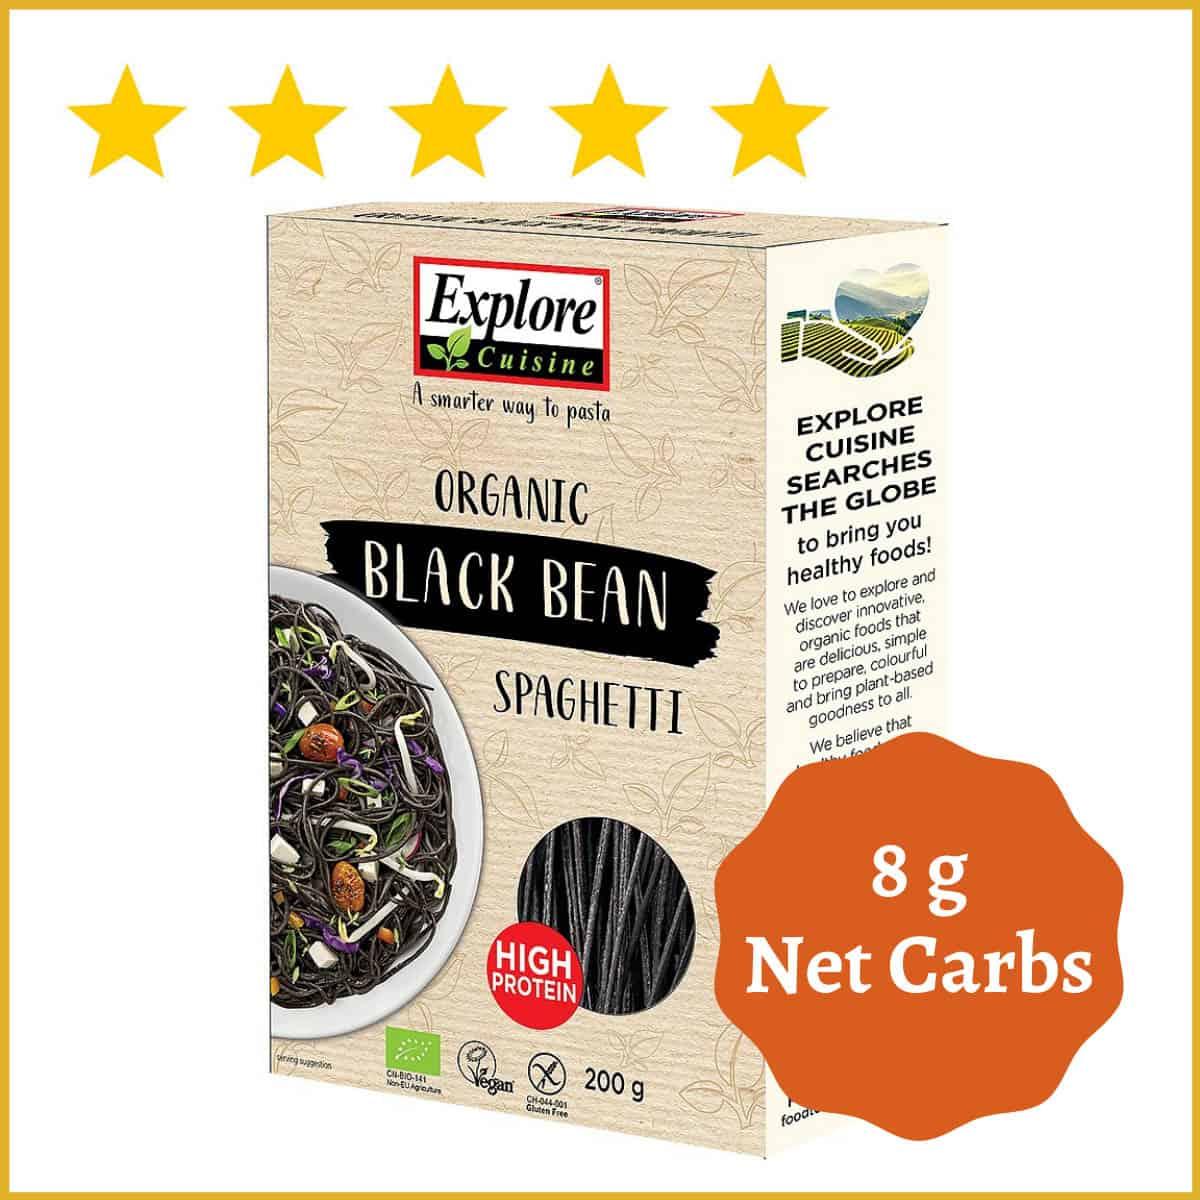 Explore Black Bean Spaghetti